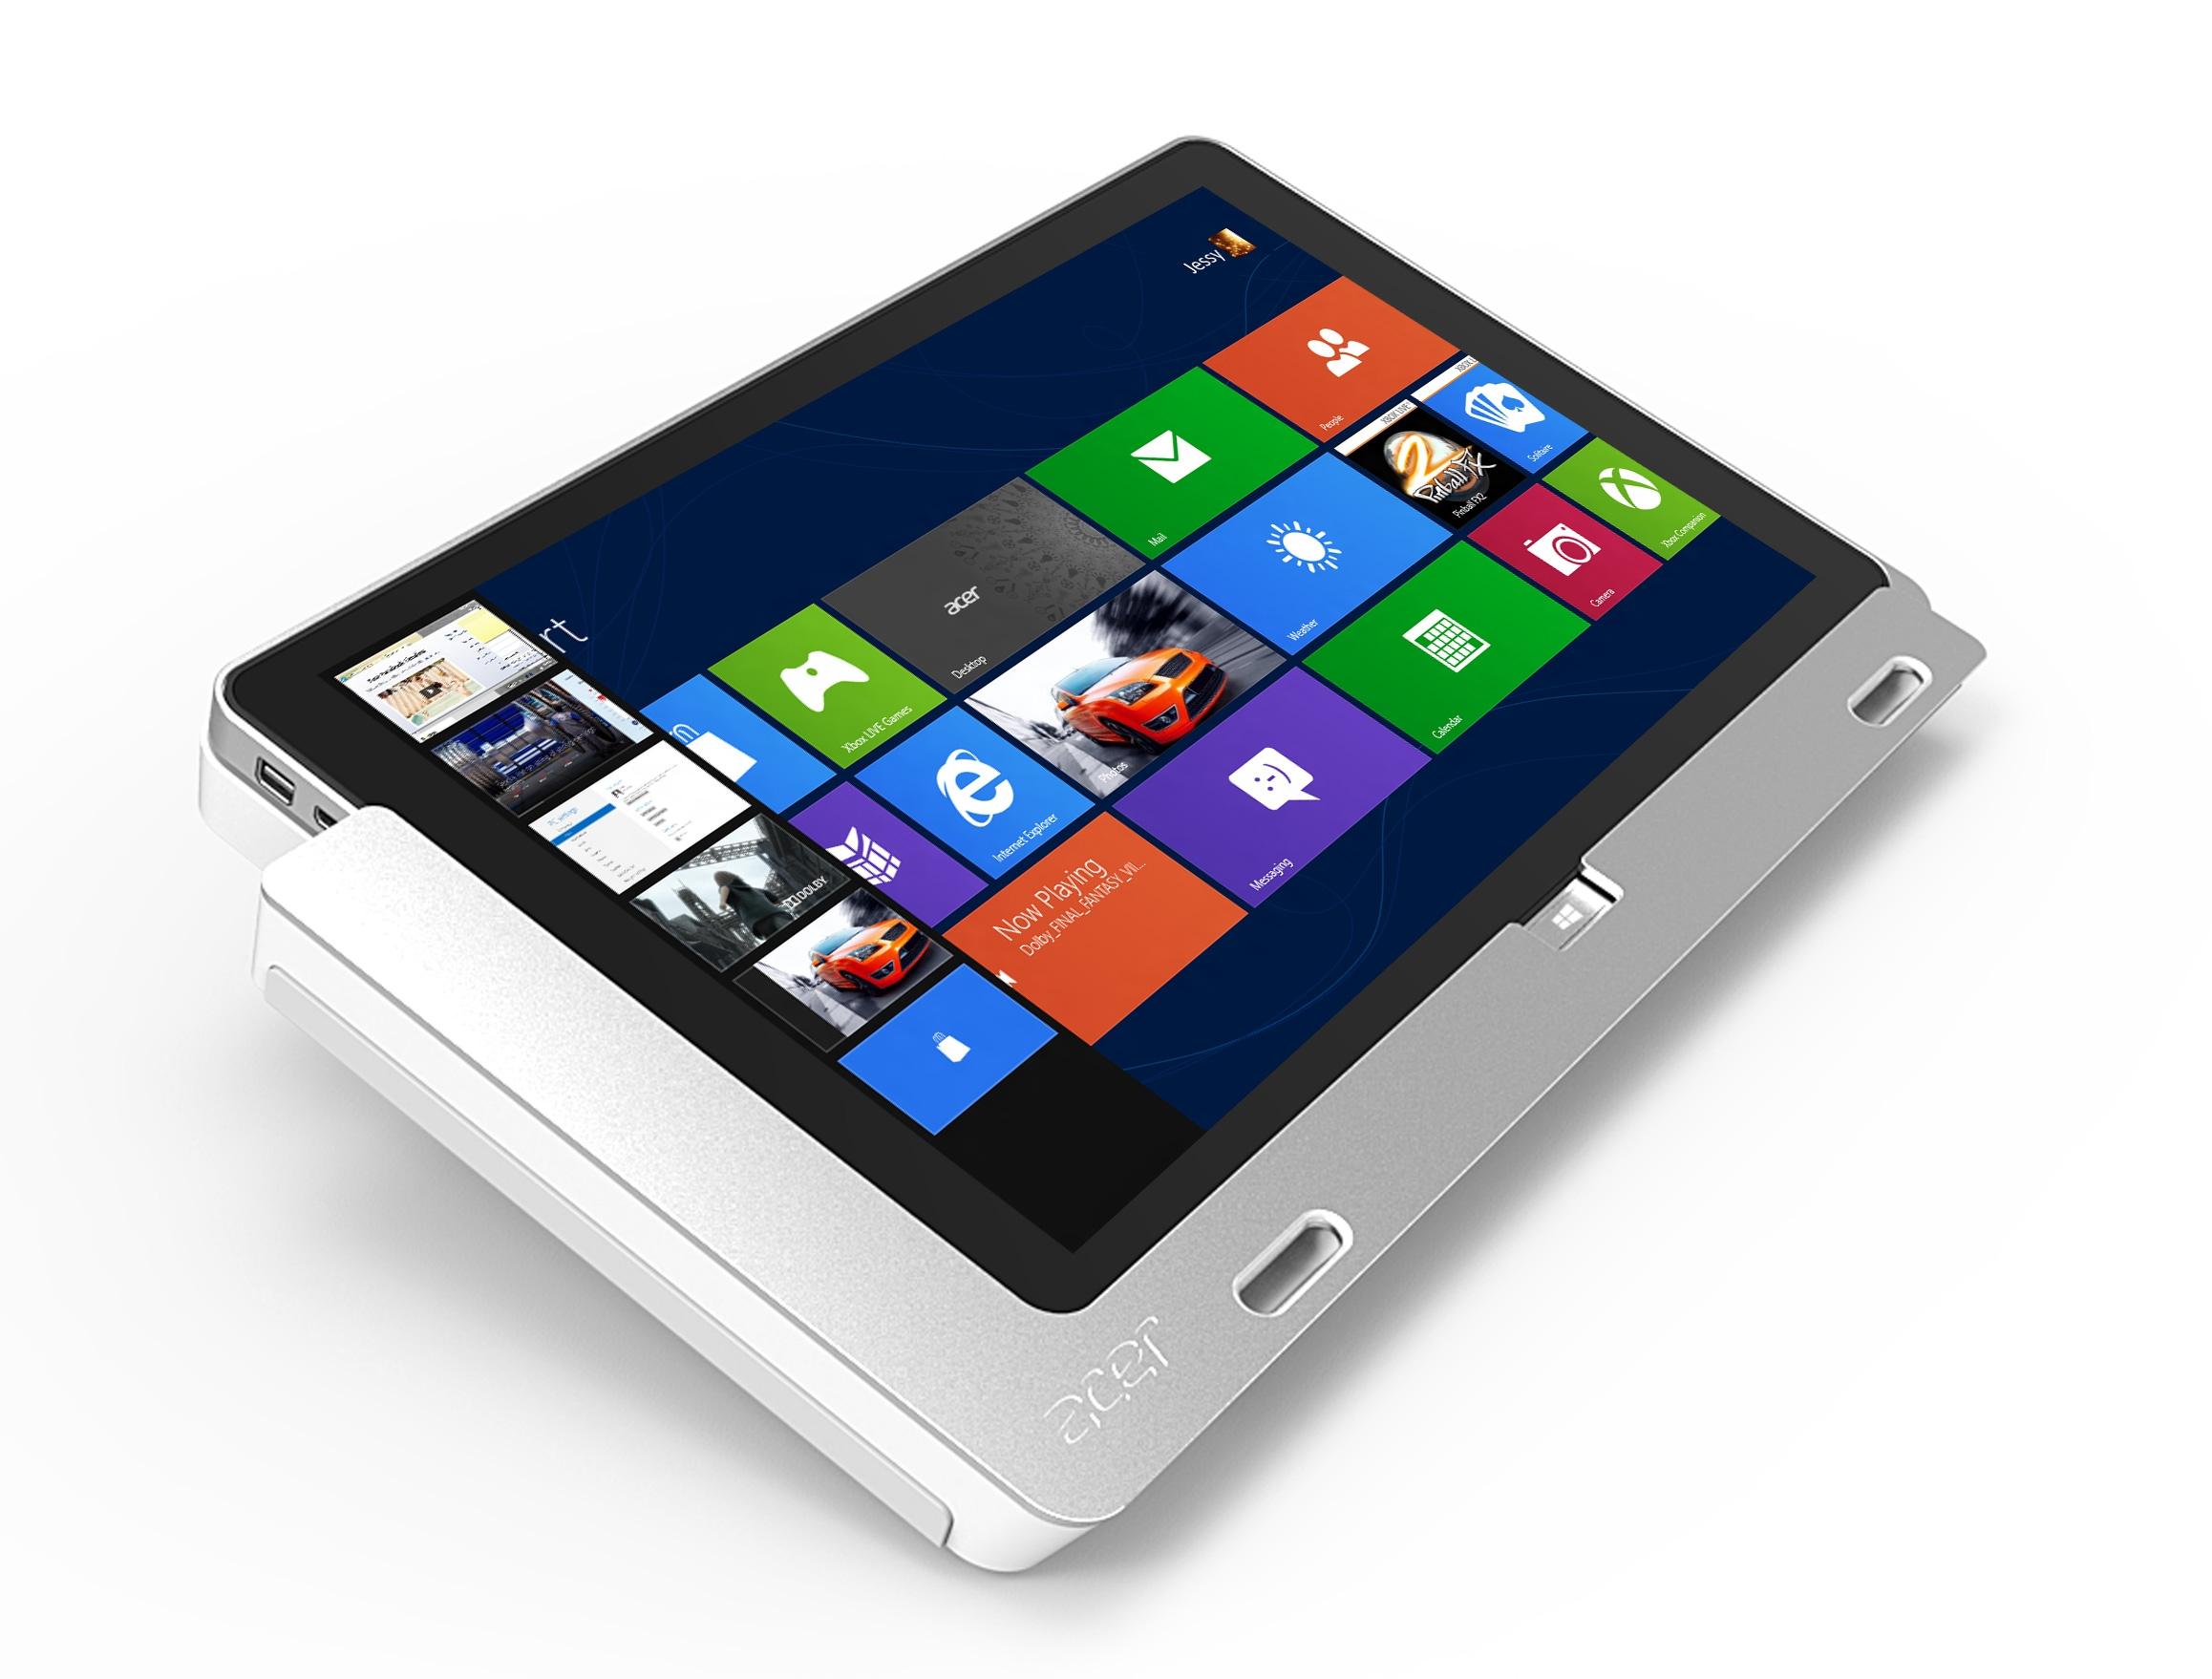 tablet wallpaper Hd windows 8 tablet wallpaper Desktop 2316x1758